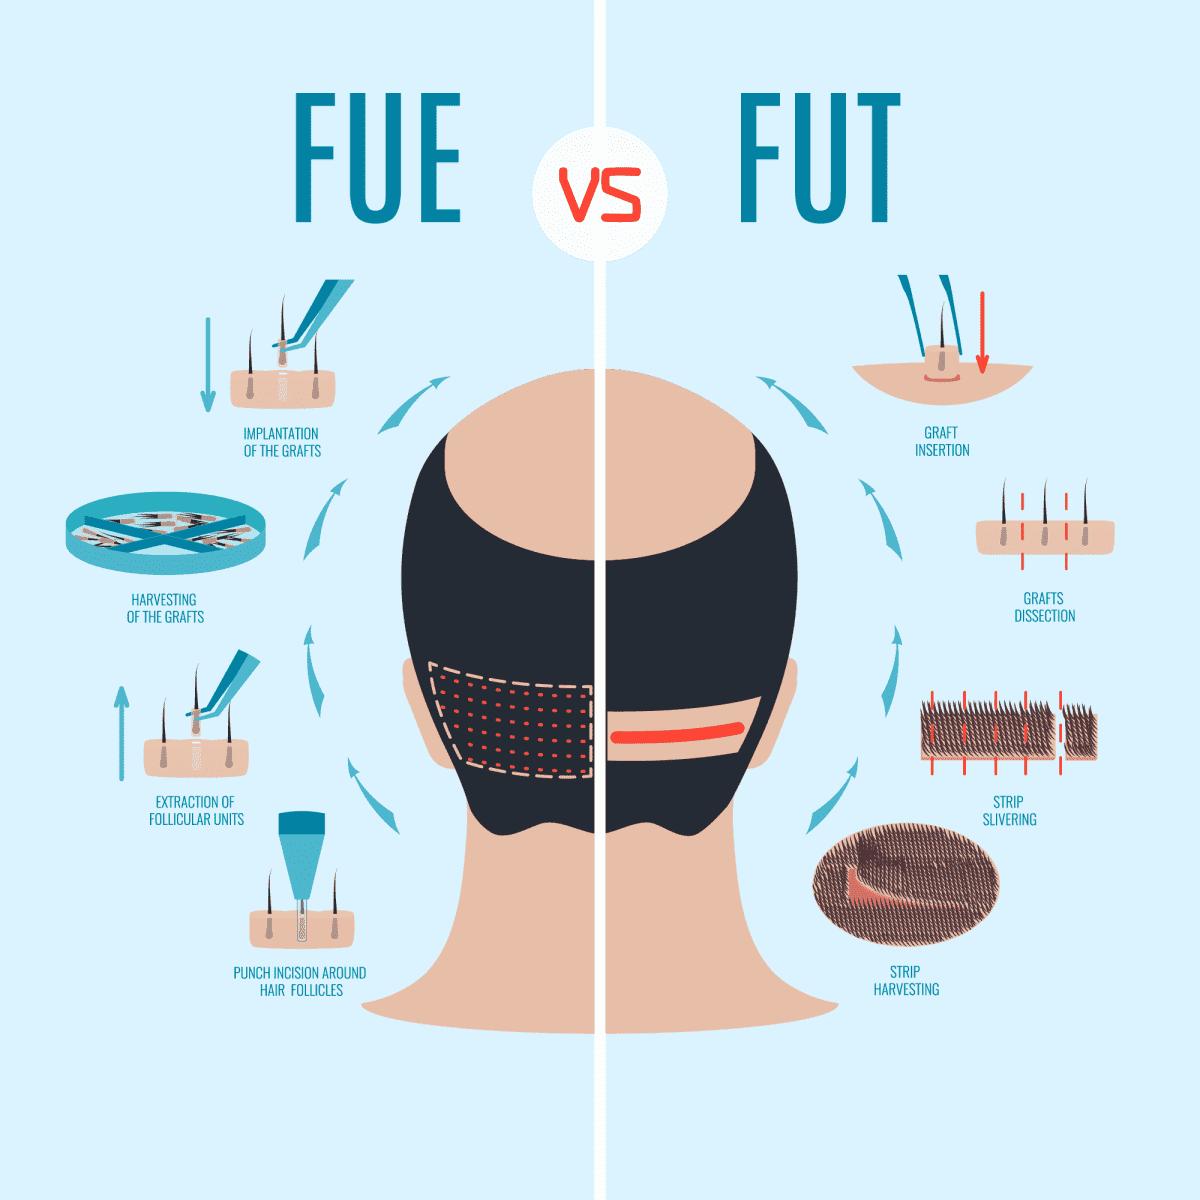 Follicular Unit Extraction (FUE) Versus Follicular Unit Transplantation (FUT)